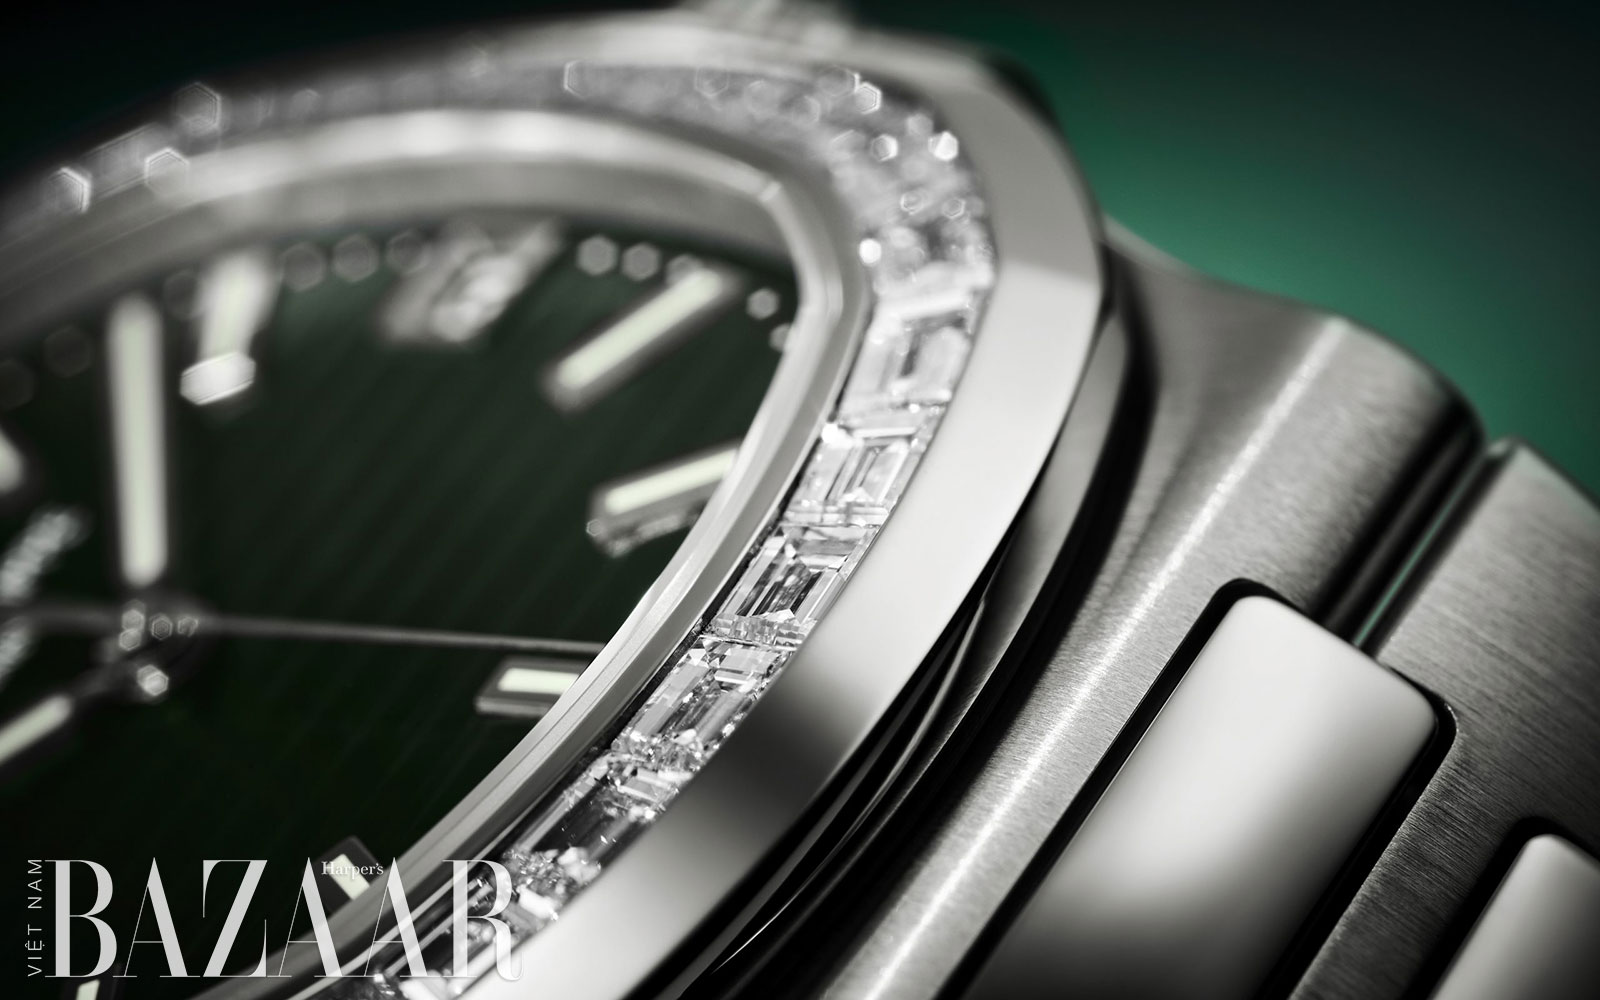 Patek Philippe ra mắt 4 mẫu đồng hồ Nautilus cho 2021 6